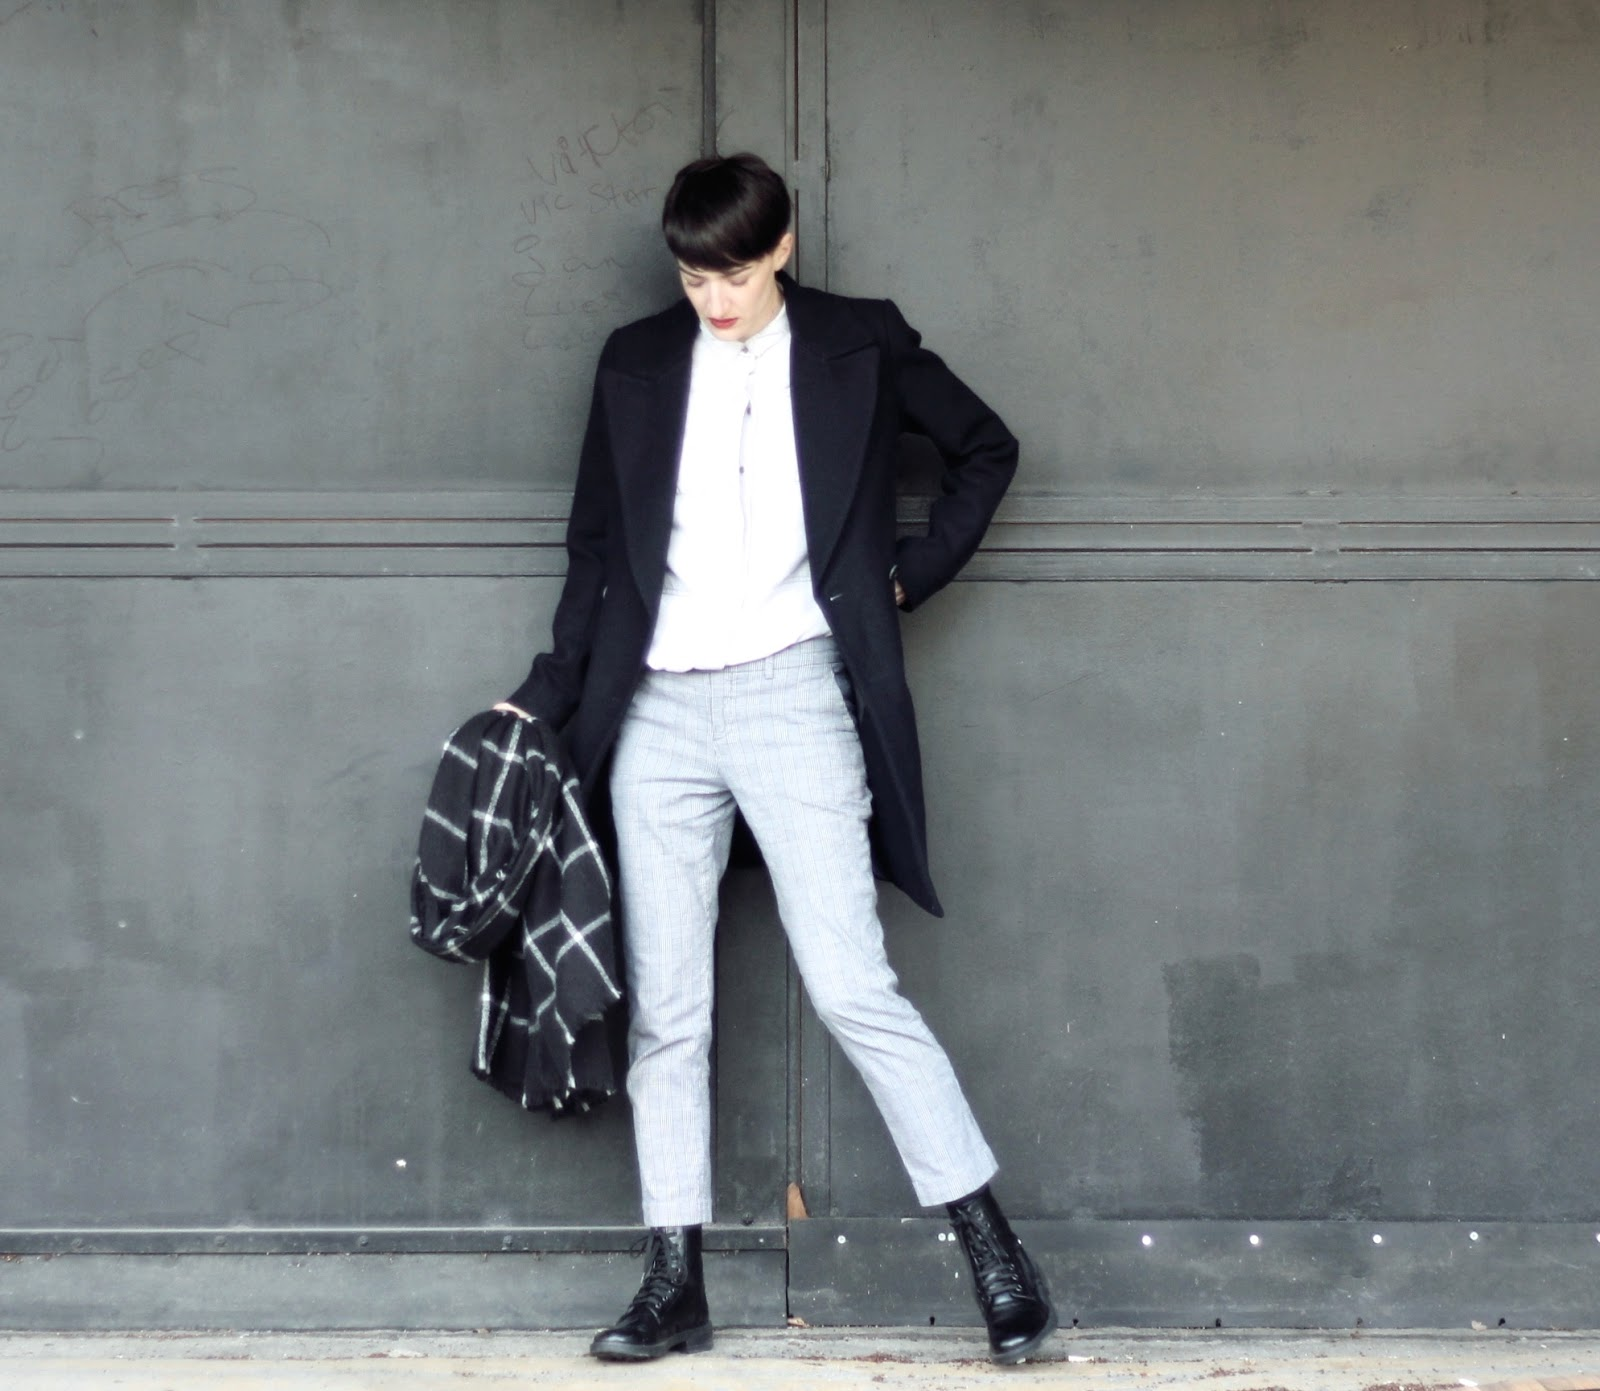 Ronald Mc Donald Topshop black boots Uniqlo  pantalon tartan court Zara chemise Zara manteau boyish duffle coat Lexie Blush